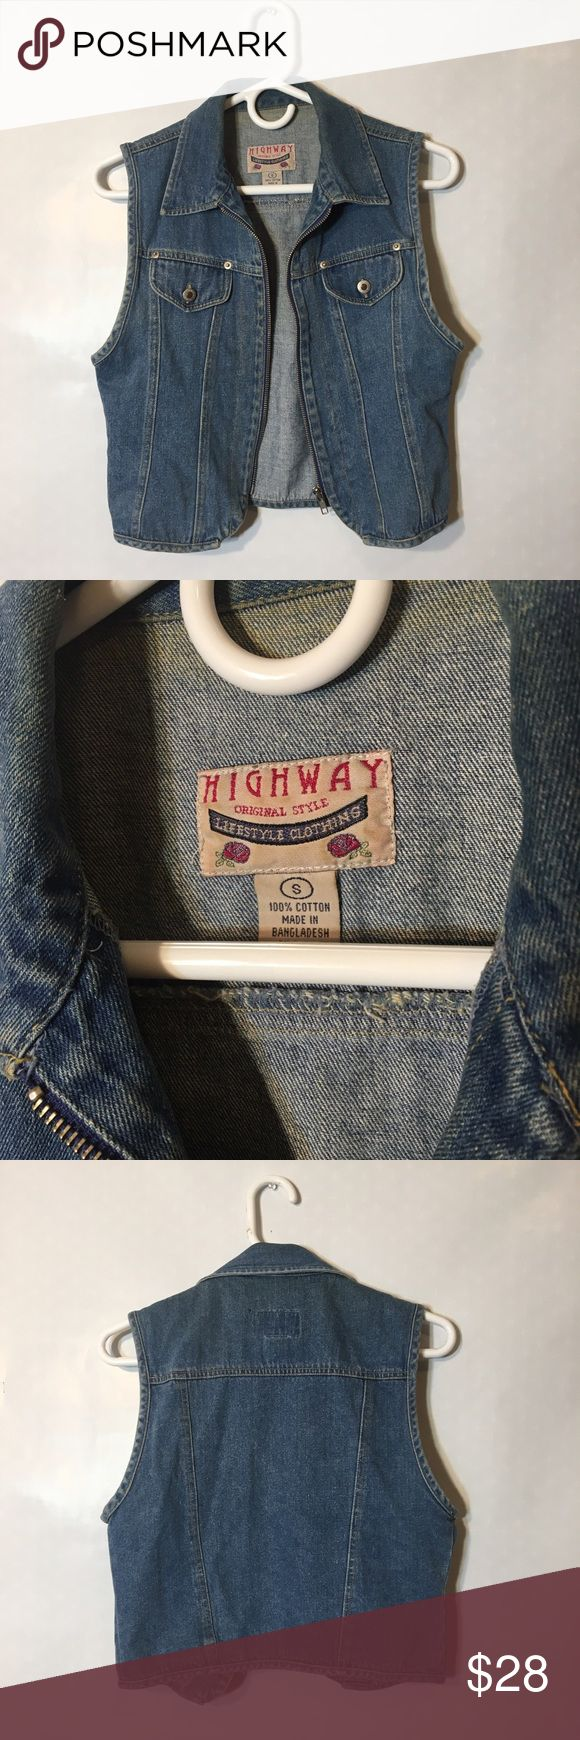 90s vtg grunge denim zip crop vest S Rad 90s vintage grunge retro style denim zip up crop vest by Highway, marked a Small, true to size. Perfect condition. Vintage Tops Crop Tops